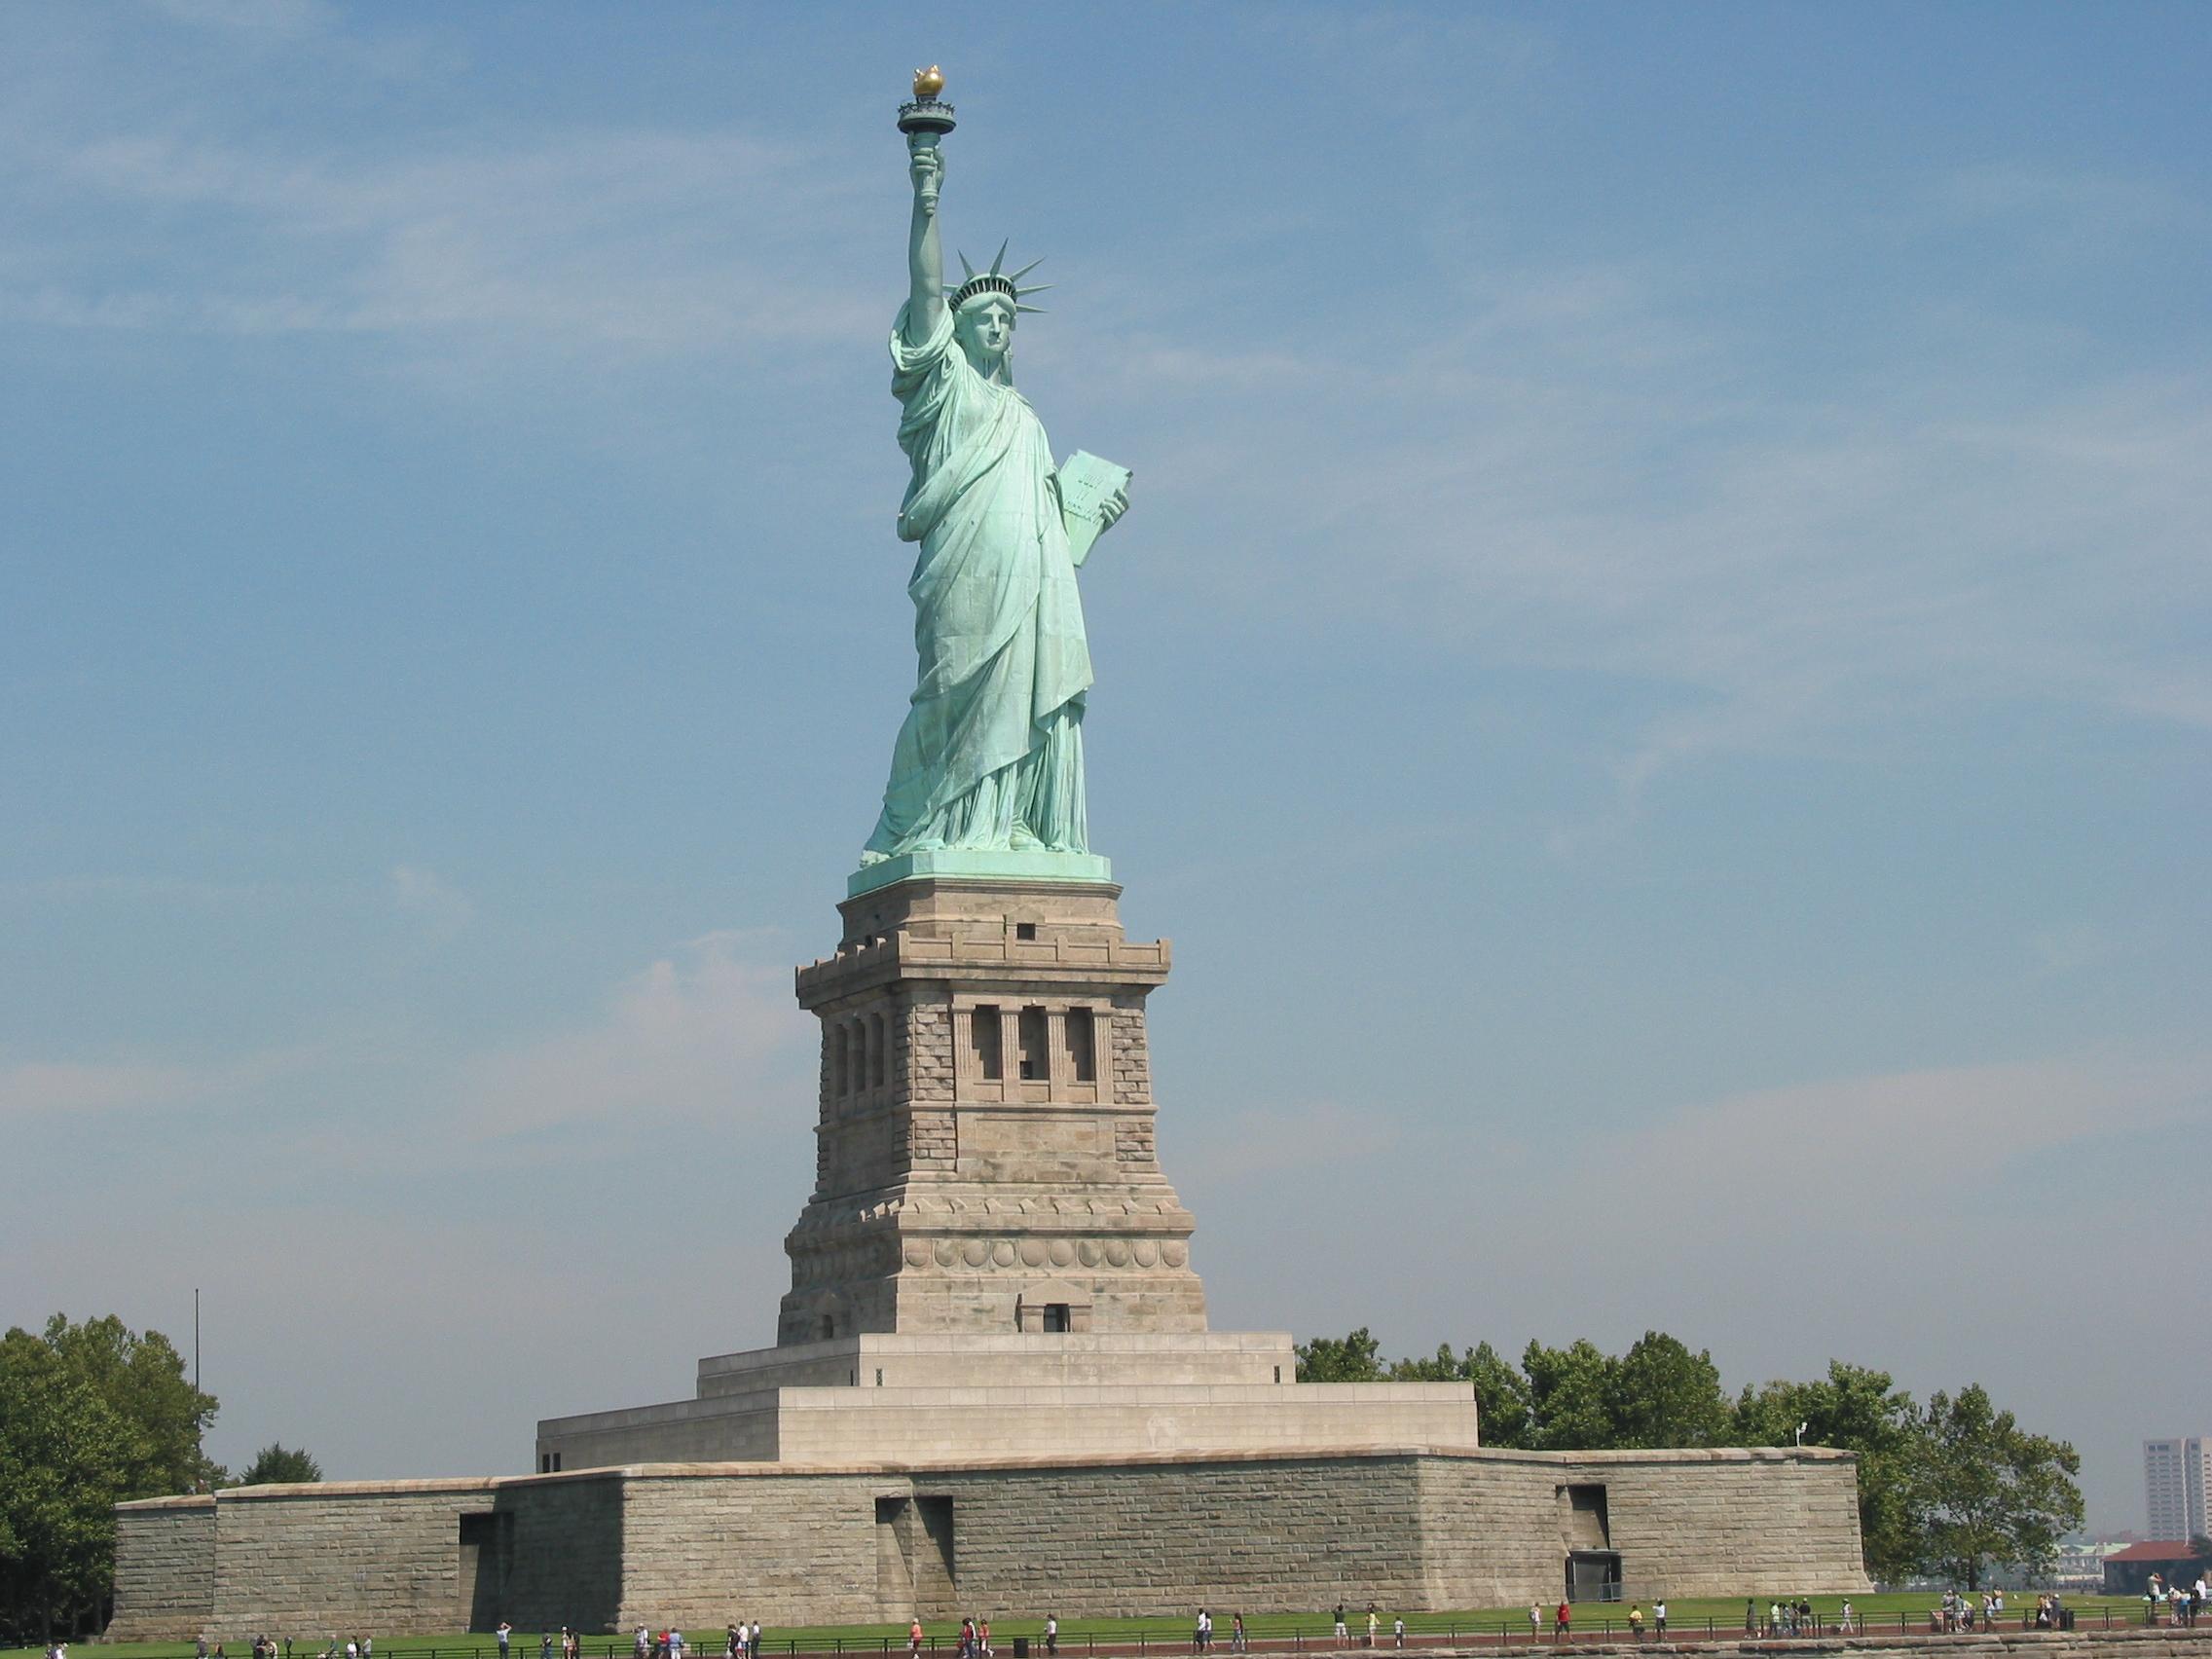 La statue de la liberte de pied en cape new york usa for Createur statue de la liberte